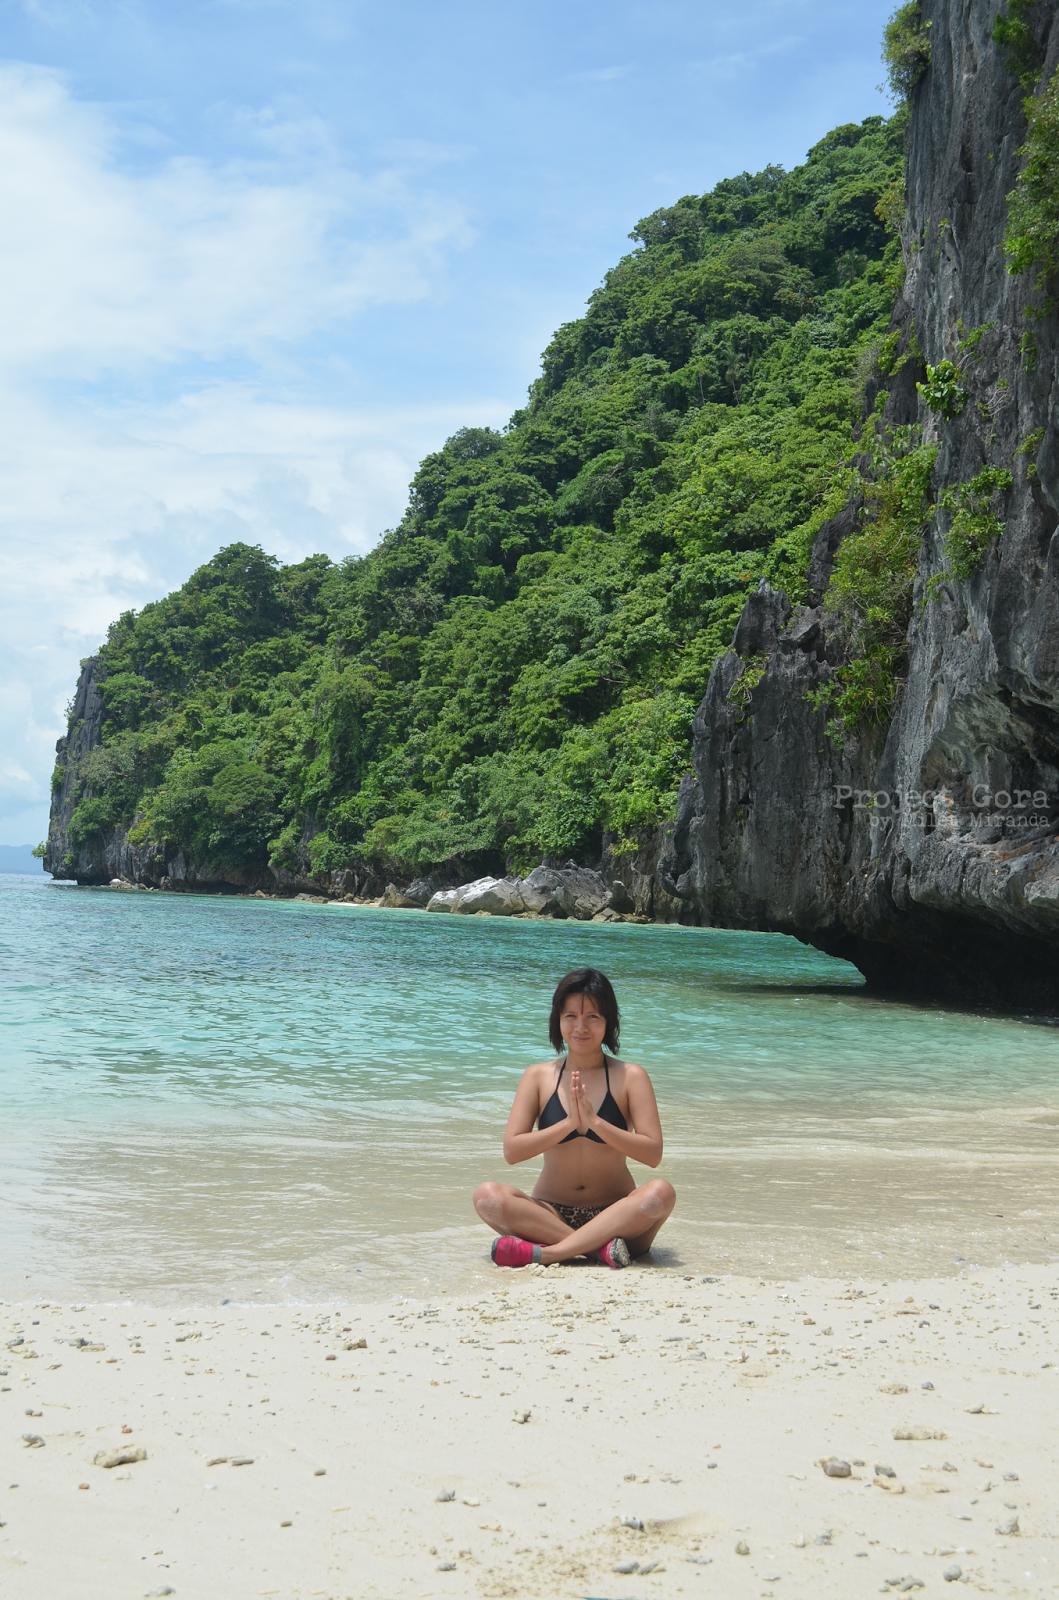 Project Gora: The Beach: Koh Phi Phi vs El Nido